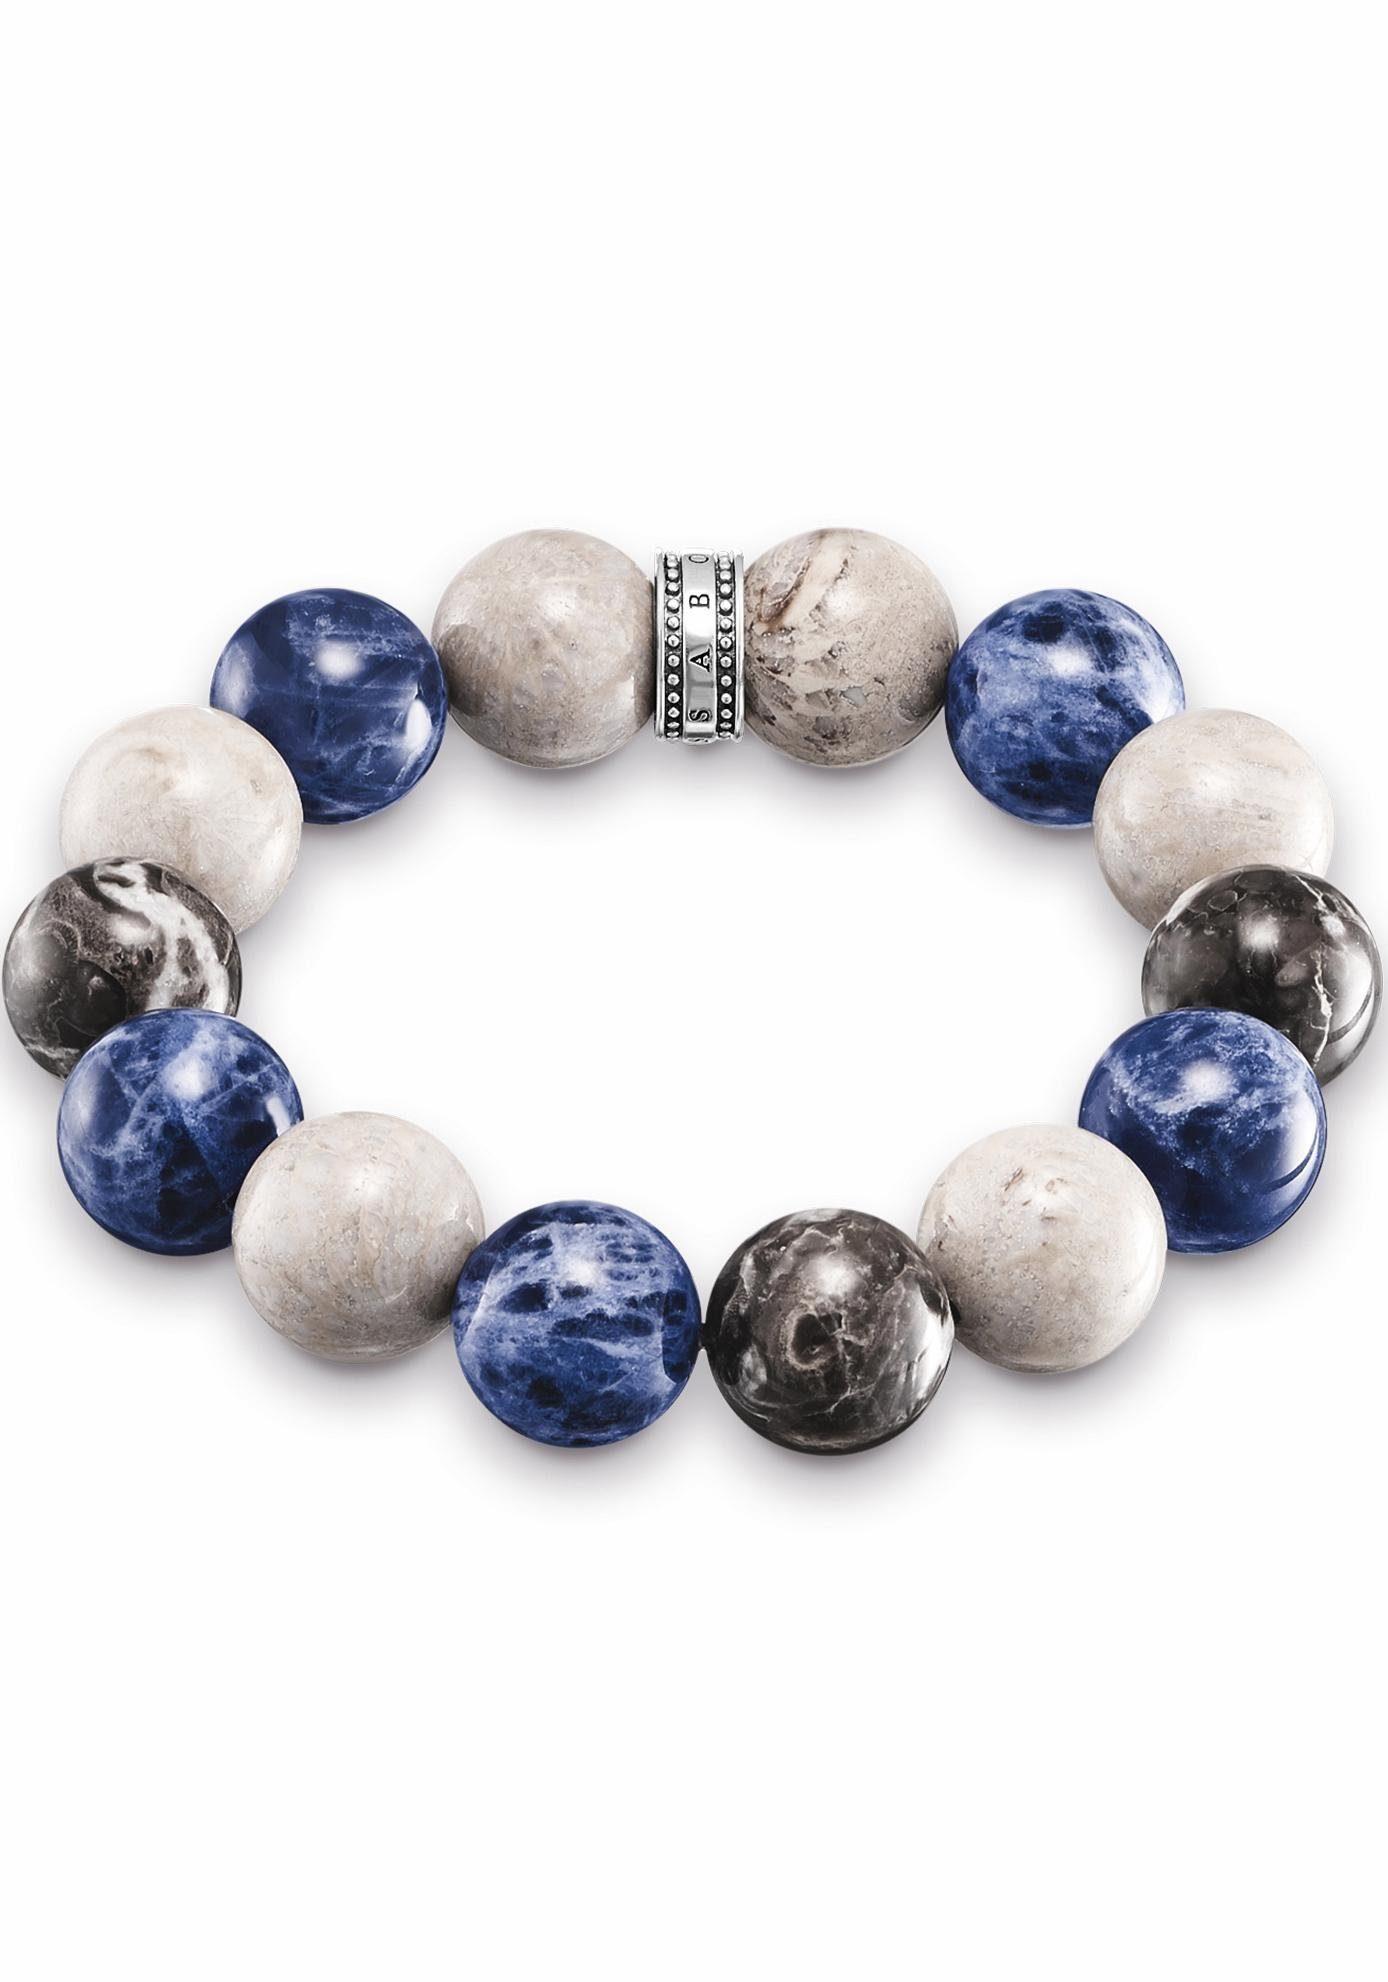 THOMAS SABO Armband »Power Bracelet Blau, Beige, Grau, A1580-362-7-L16« mit Jaspis, Marmor und Sodalith